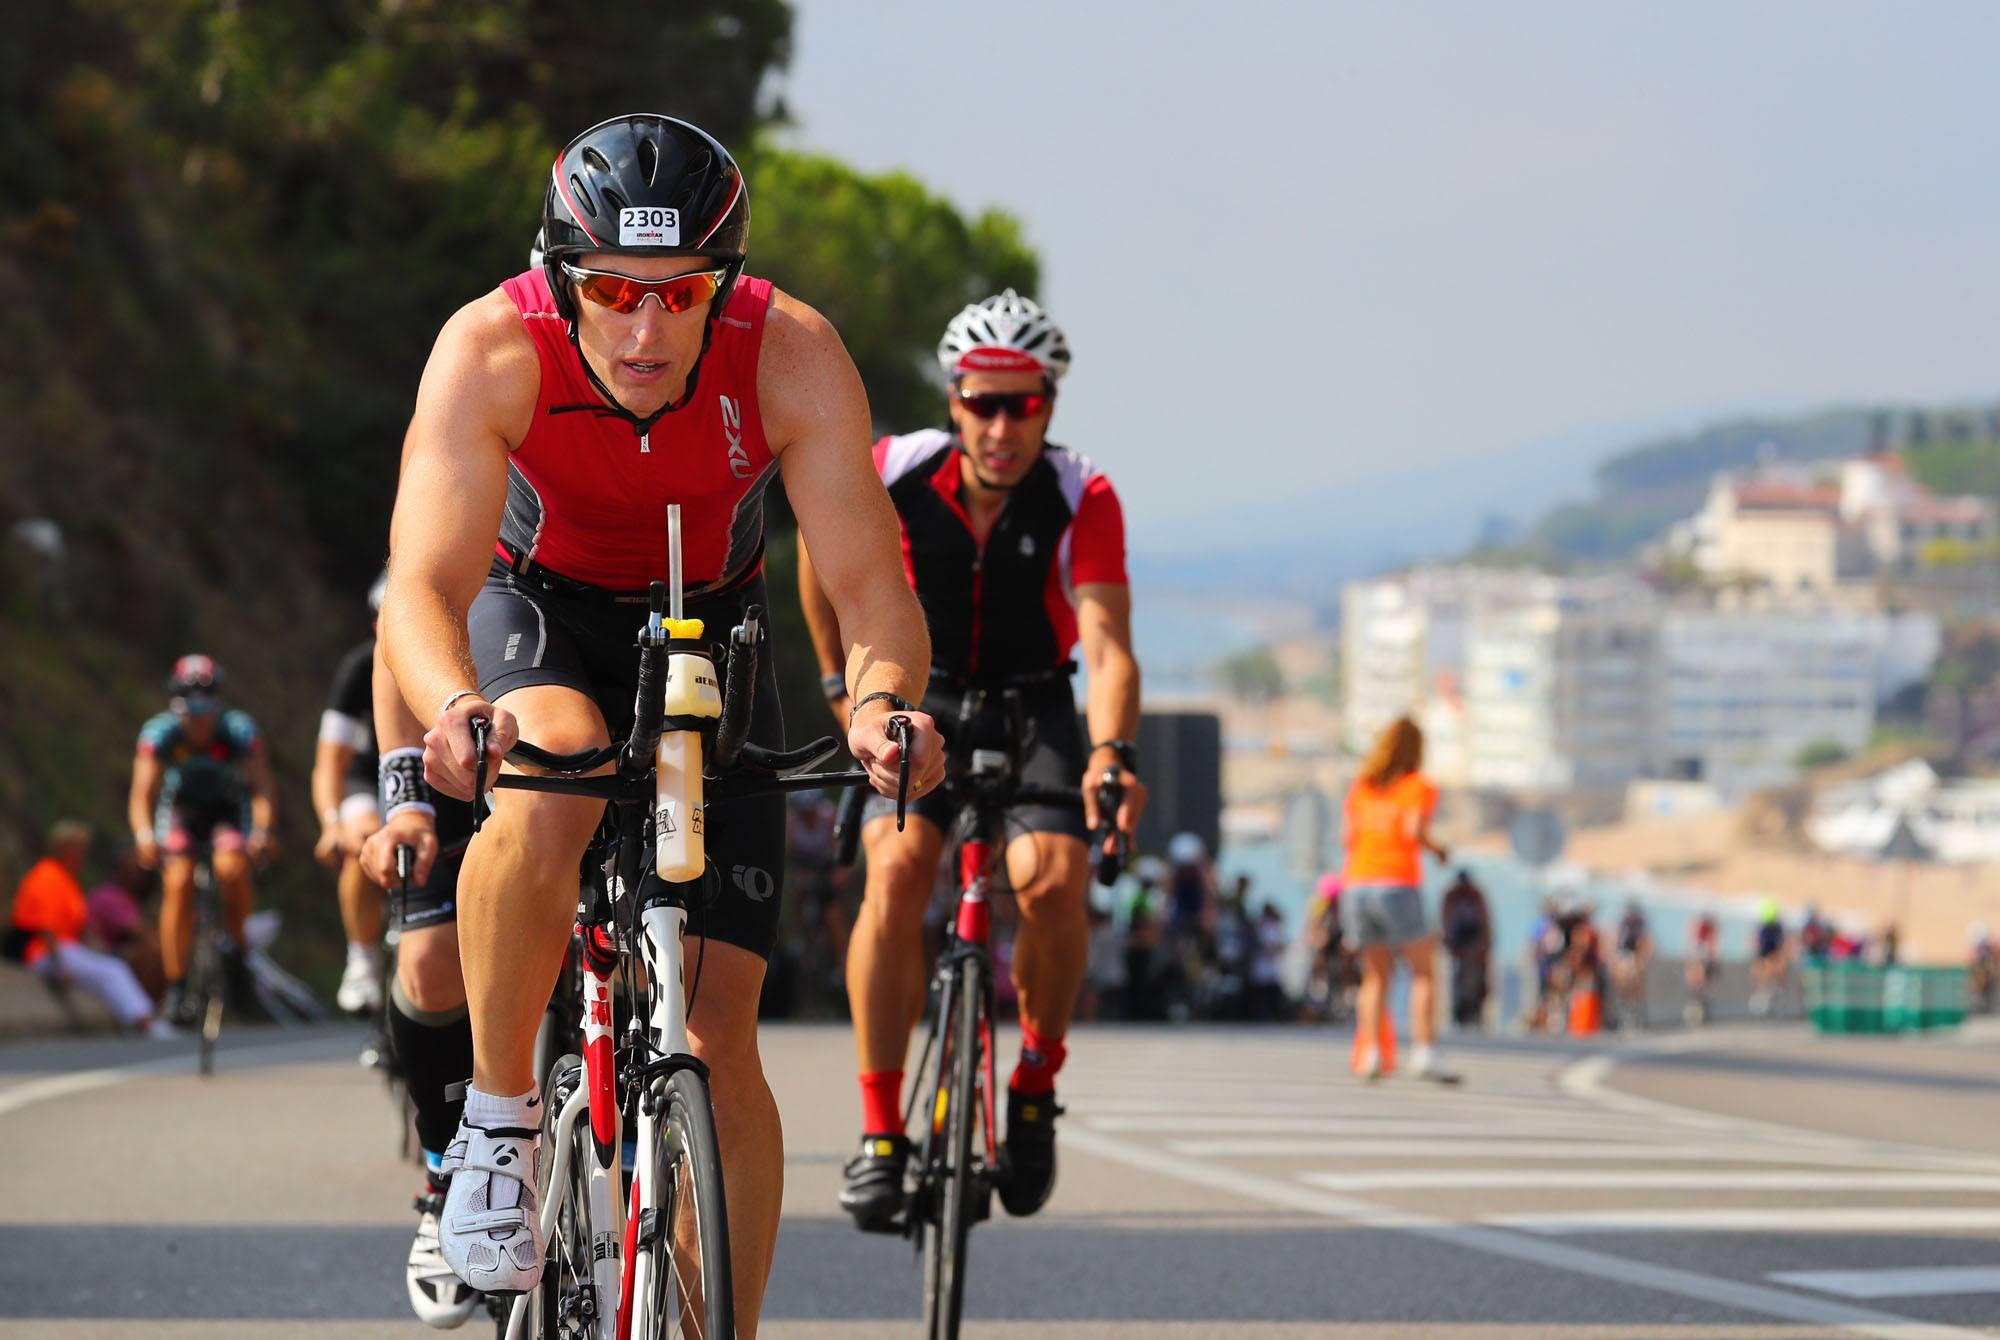 Tim Rivenbark Ironman